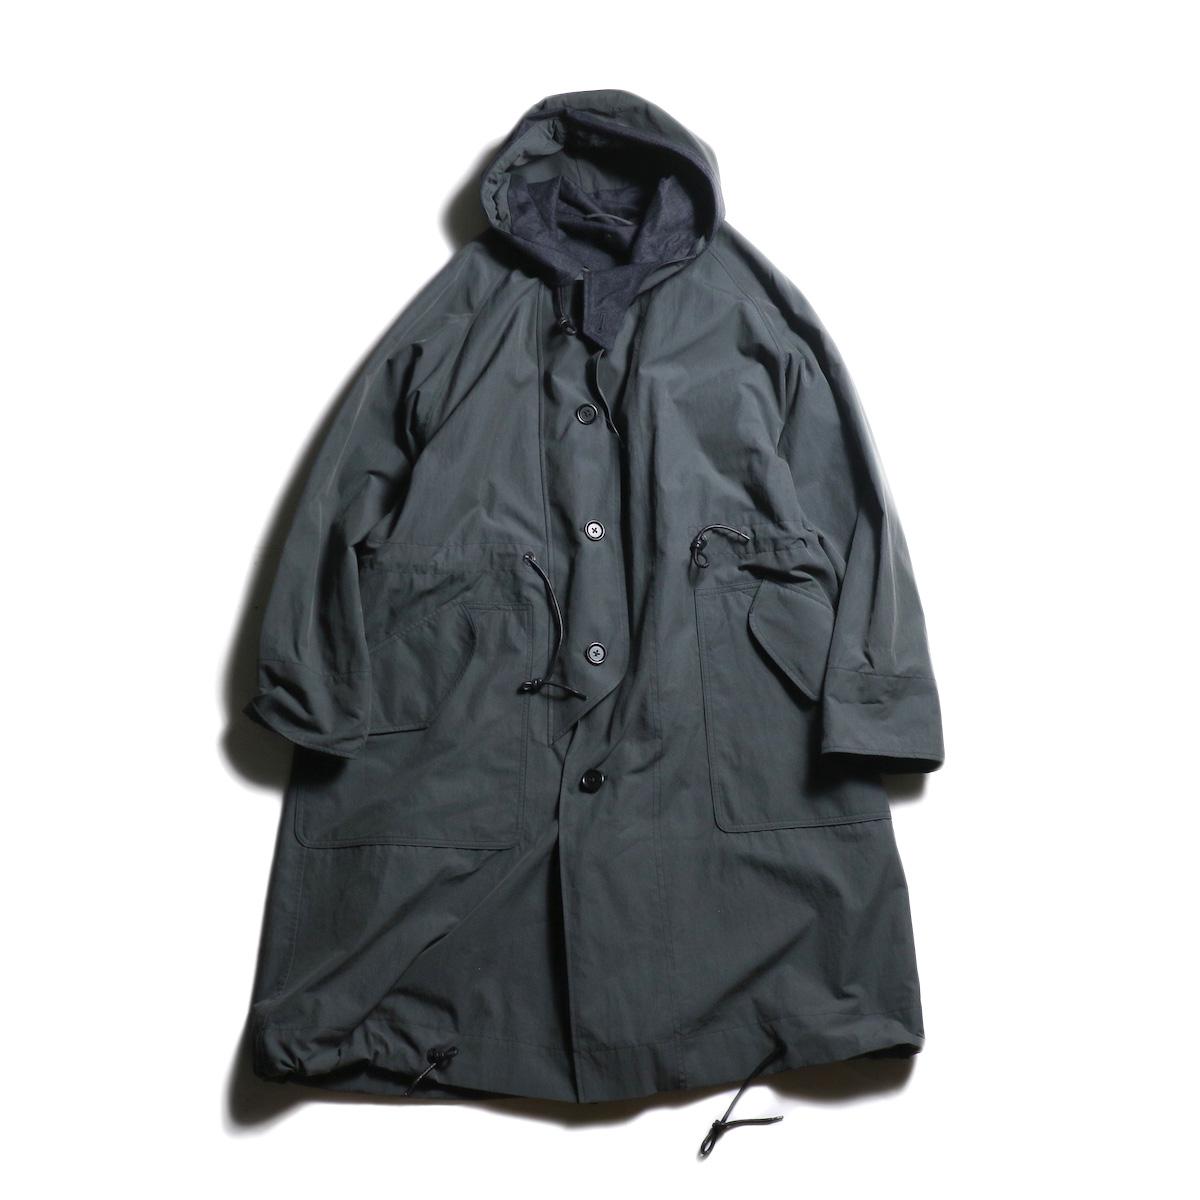 Kaptain Sunshine / All Weather Coat (Charcoal Gray)